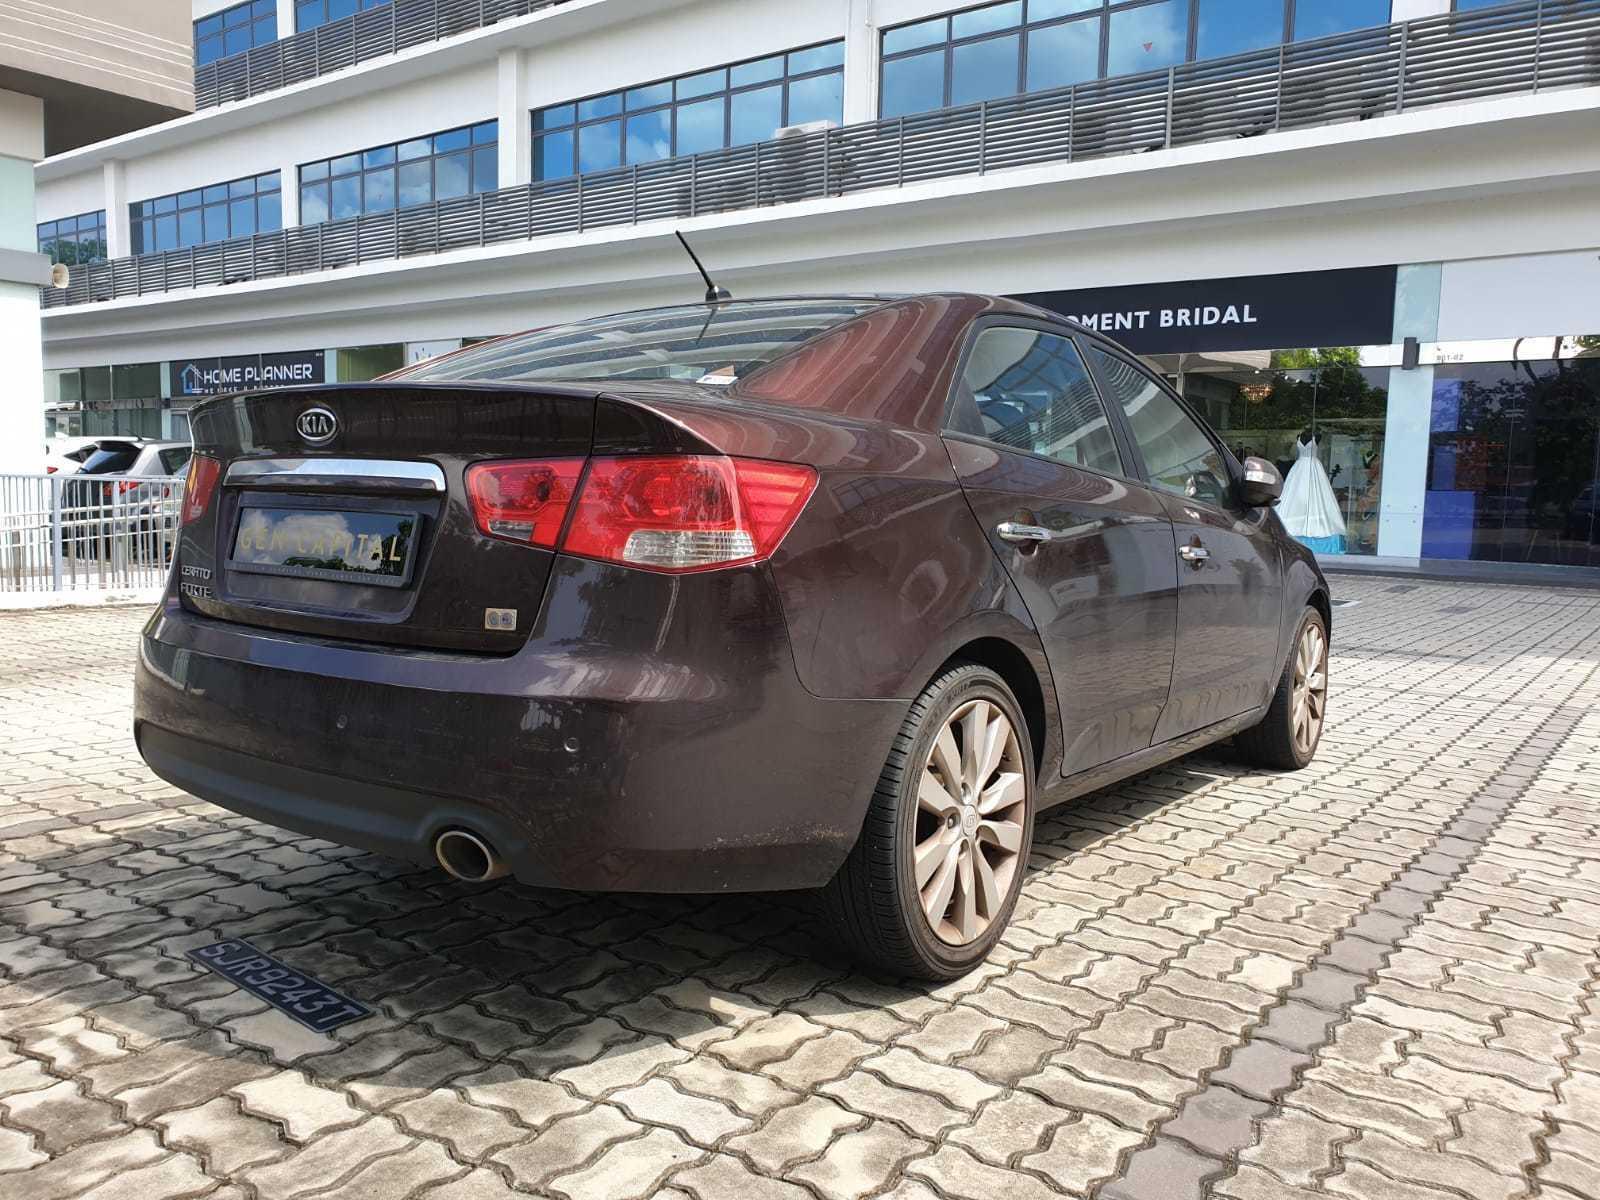 Kia Cerato Forte 1.6A - Lowest rental rates, good condition!